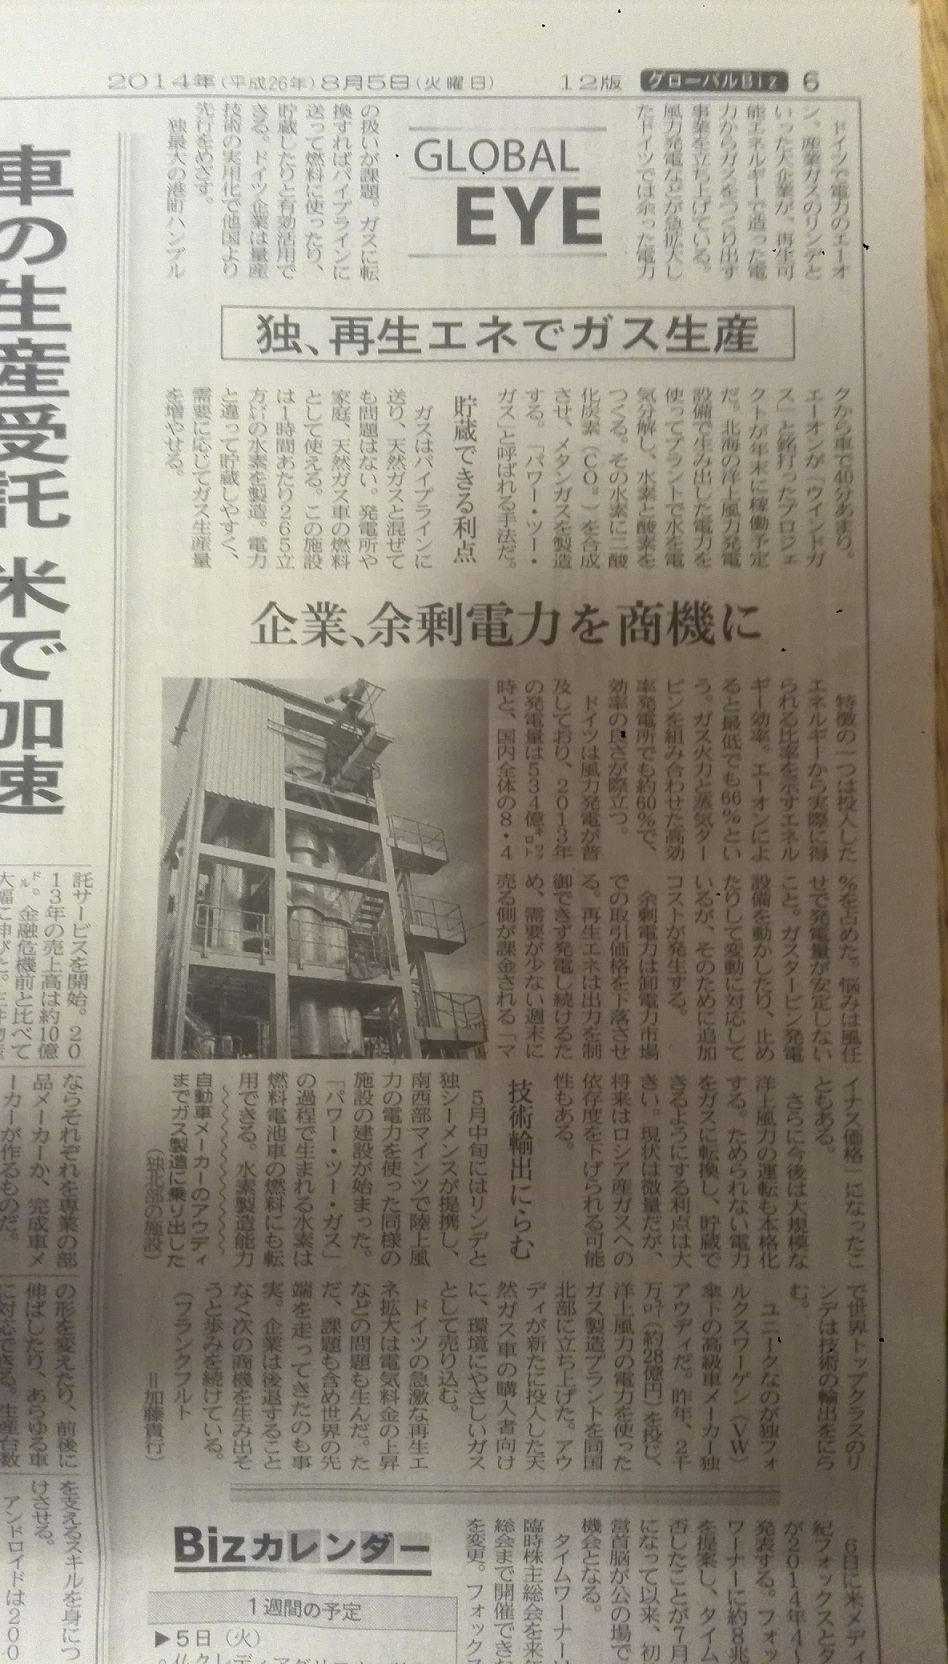 日経P2G記事